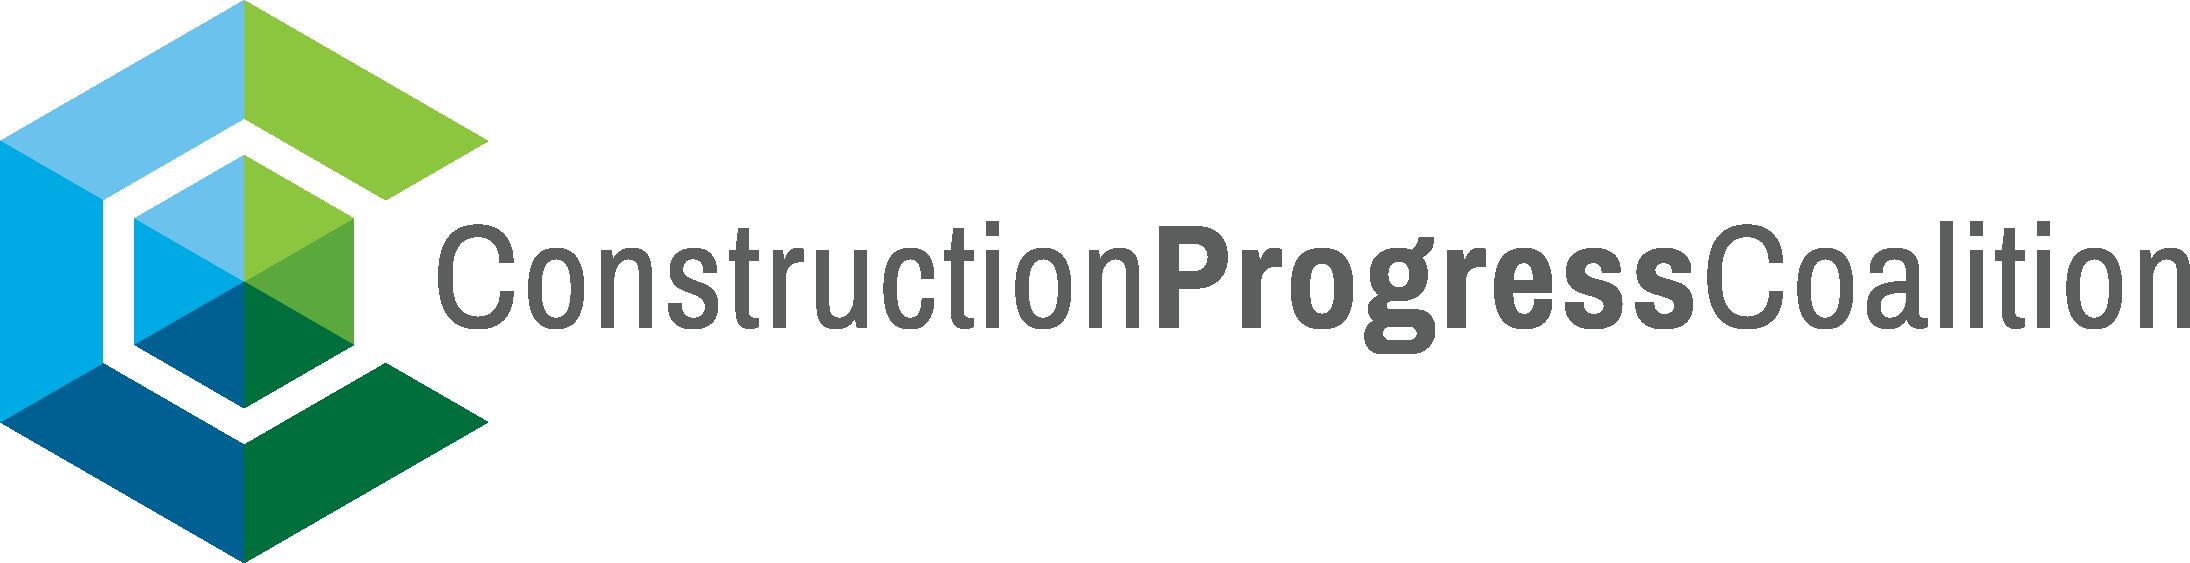 SILVER - Construction Progress Coalition.png